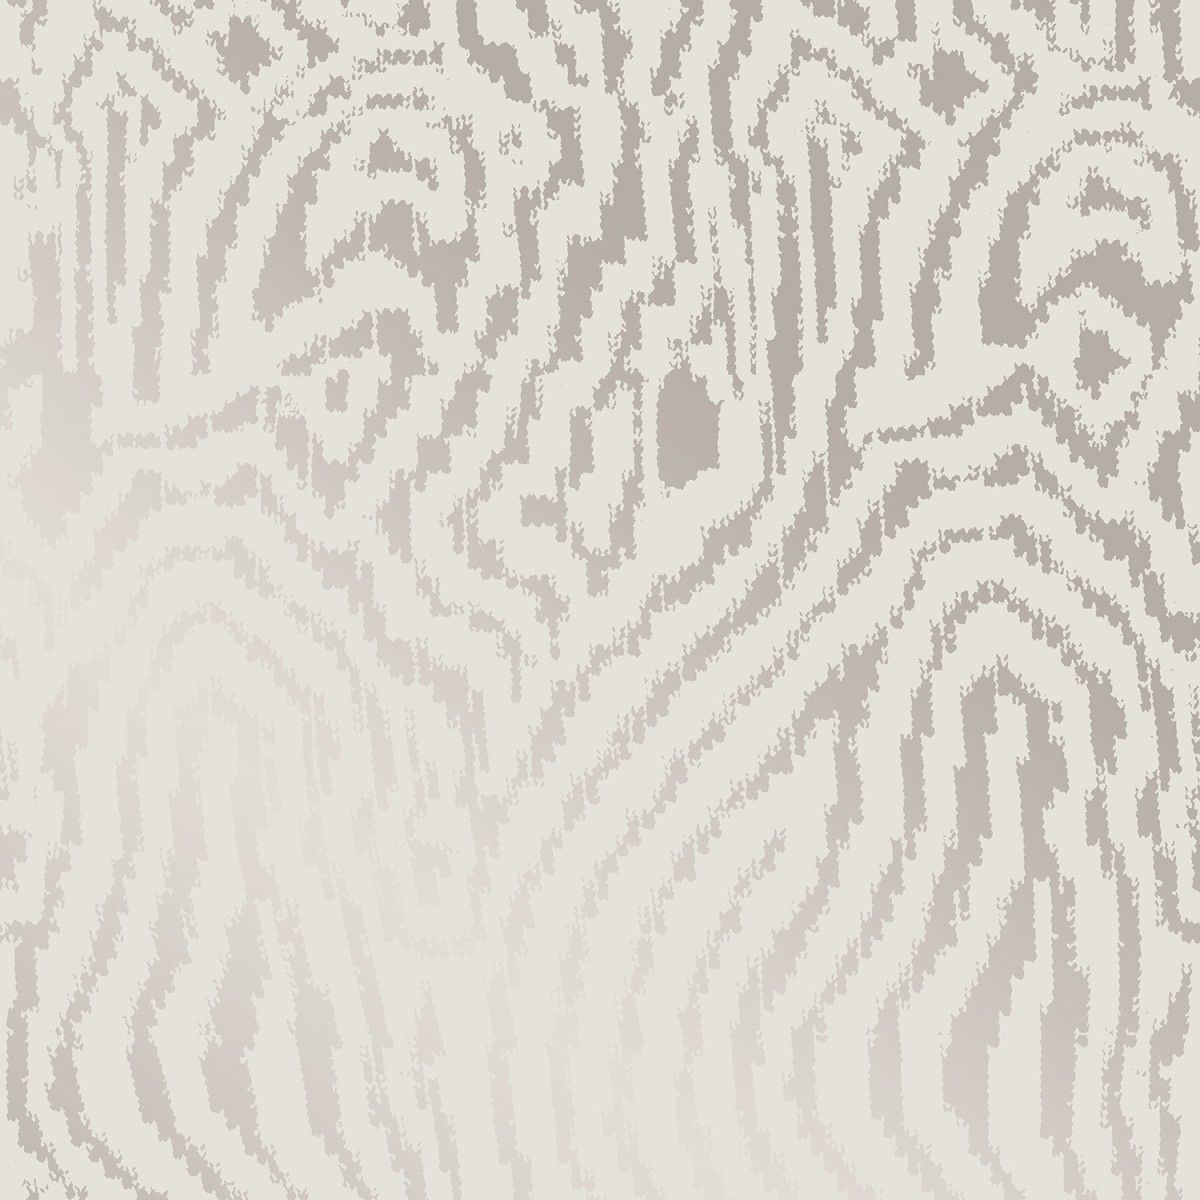 Zebra Cynthia Rowley Designer Collections Shop Tempaper Designs Zebra Wallpaper Removable Wallpaper Self Adhesive Wallpaper